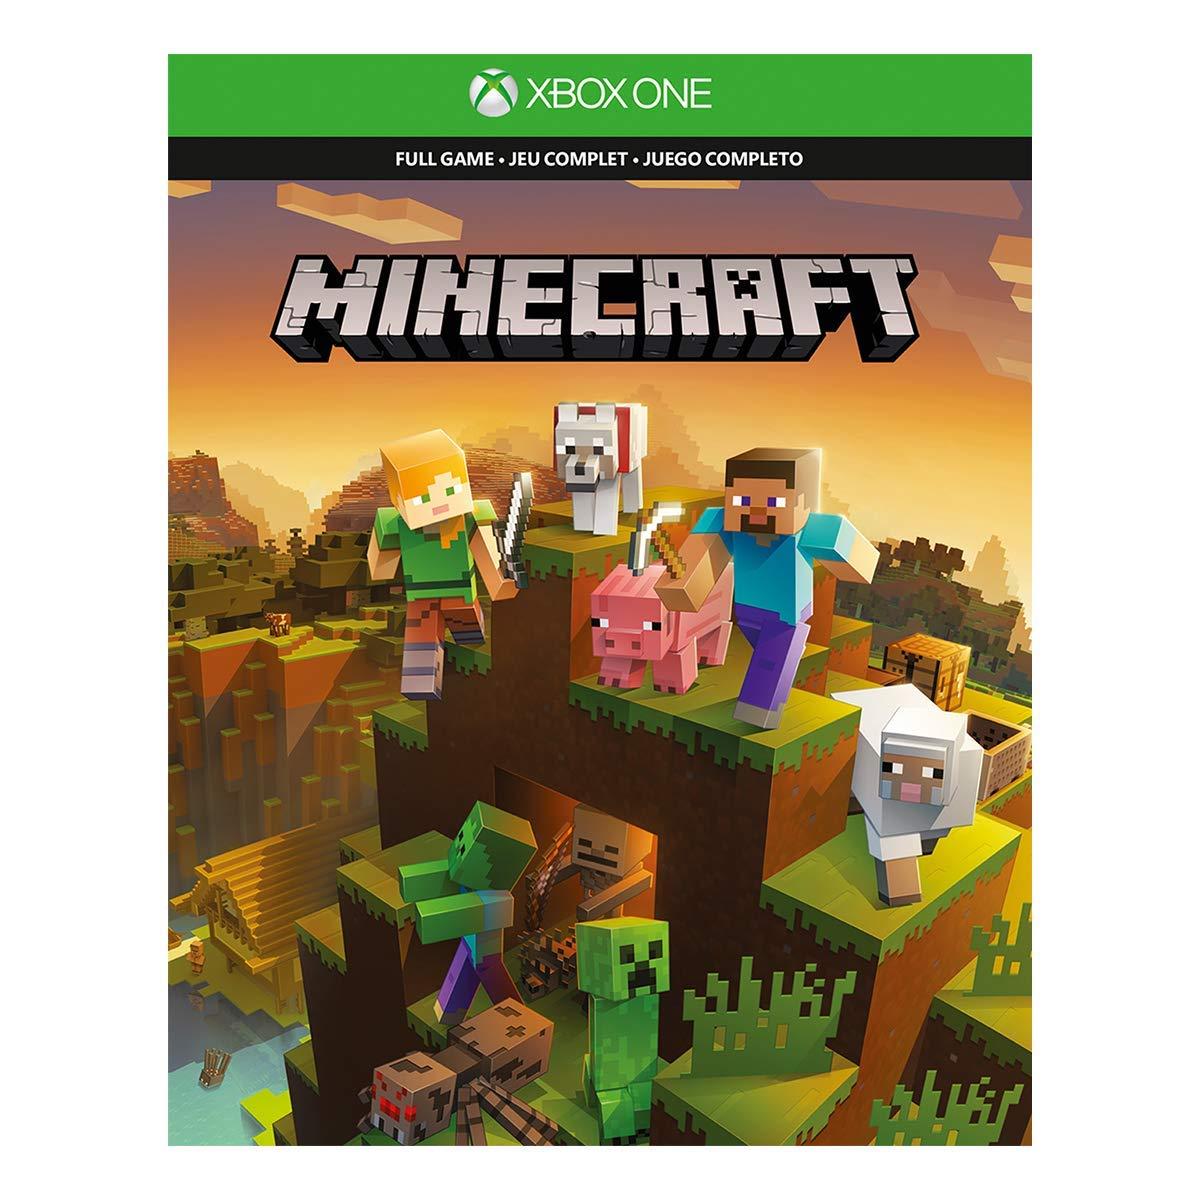 Xbox One S 1TB Console - Minecraft Creators Bundle (Renewed) by Microsoft (Image #4)